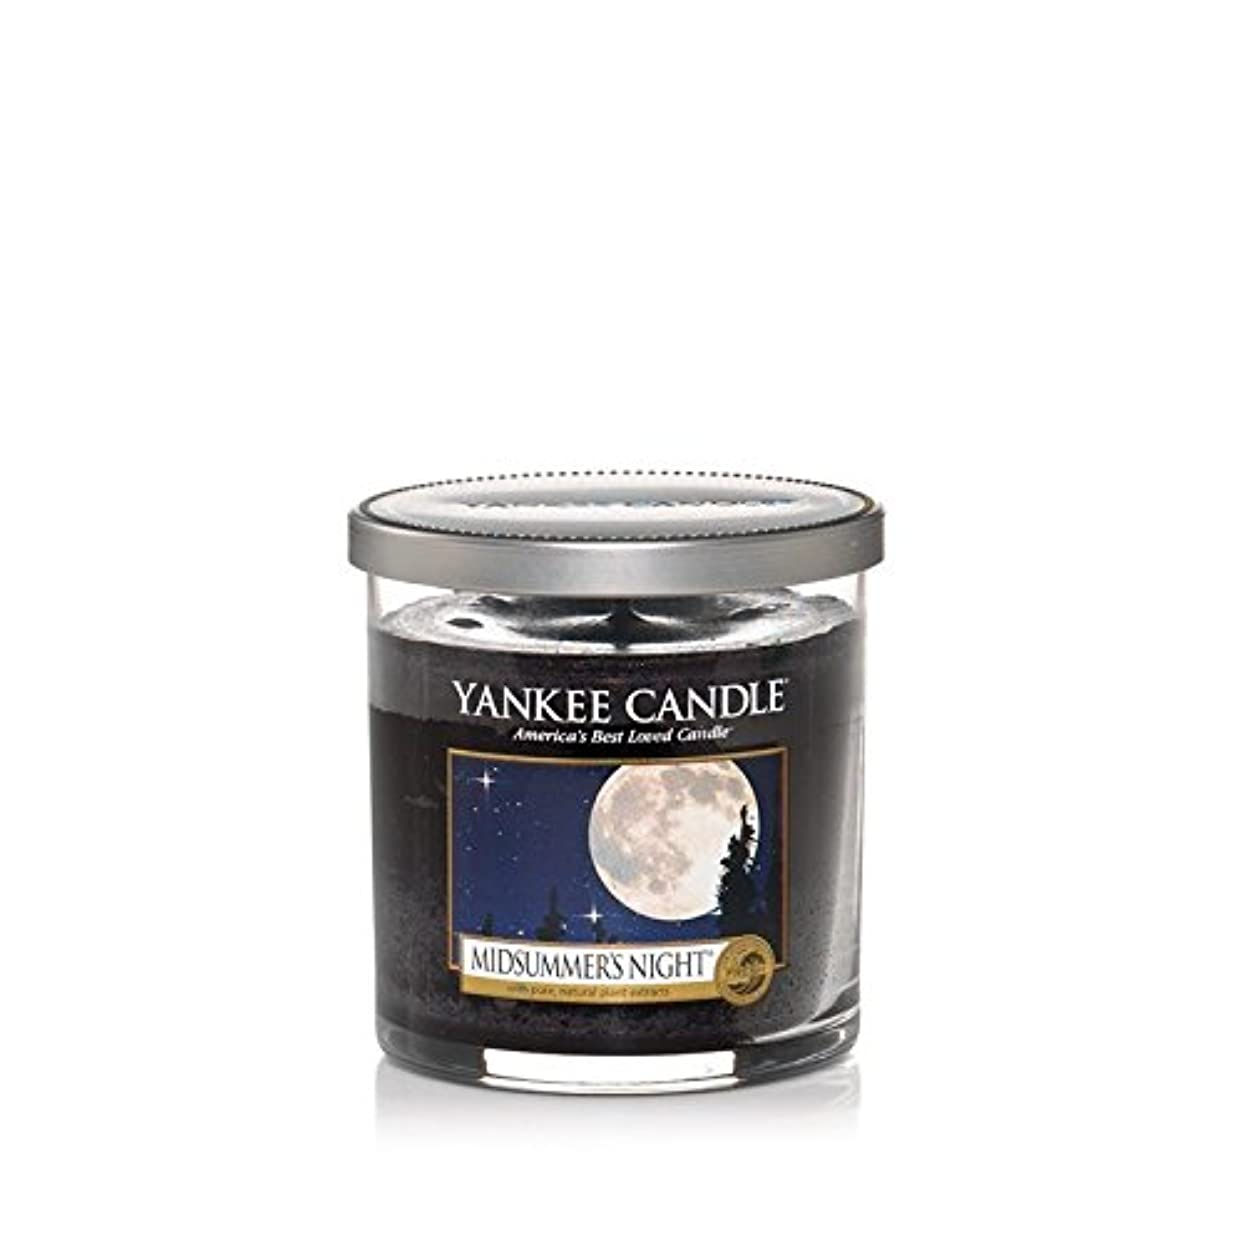 Yankee Candles Small Pillar Candle - Midsummers Night (Pack of 6) - ヤンキーキャンドルの小さな柱キャンドル - Midsummers夜 (x6) [並行輸入品]